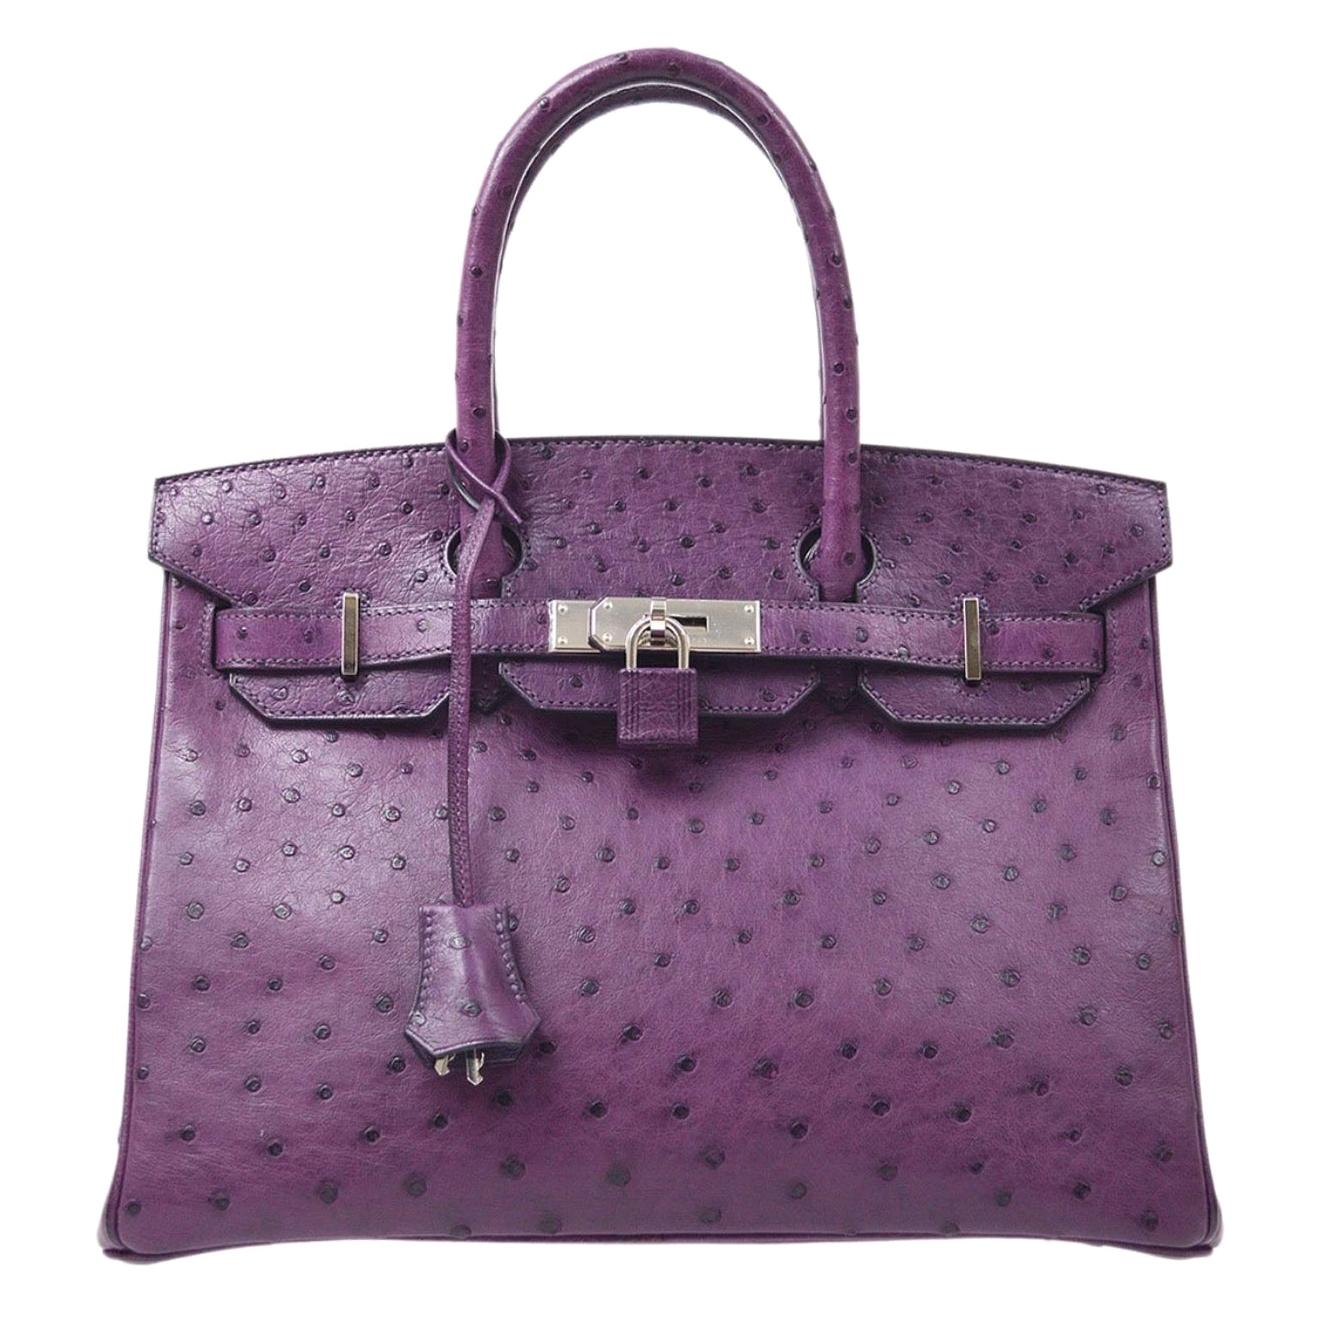 Hermes Birkin 30 Purple Ostrich Exotic Silver Top Handle Satchel Tote Bag